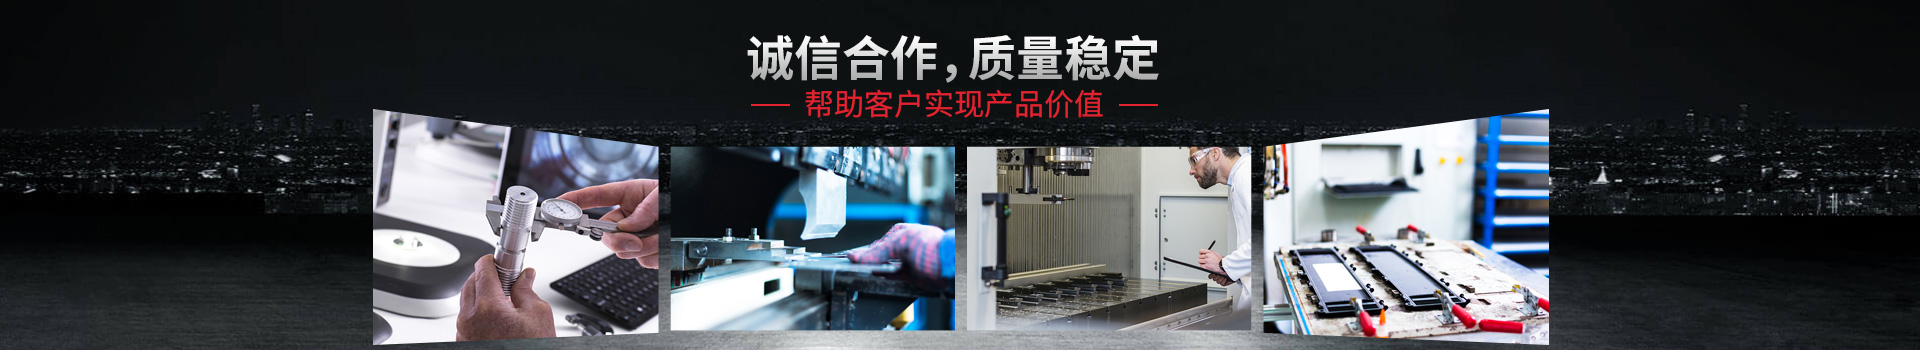 CNC精密机械加工,深圳CNC加工厂家——诚信合作,质量稳定